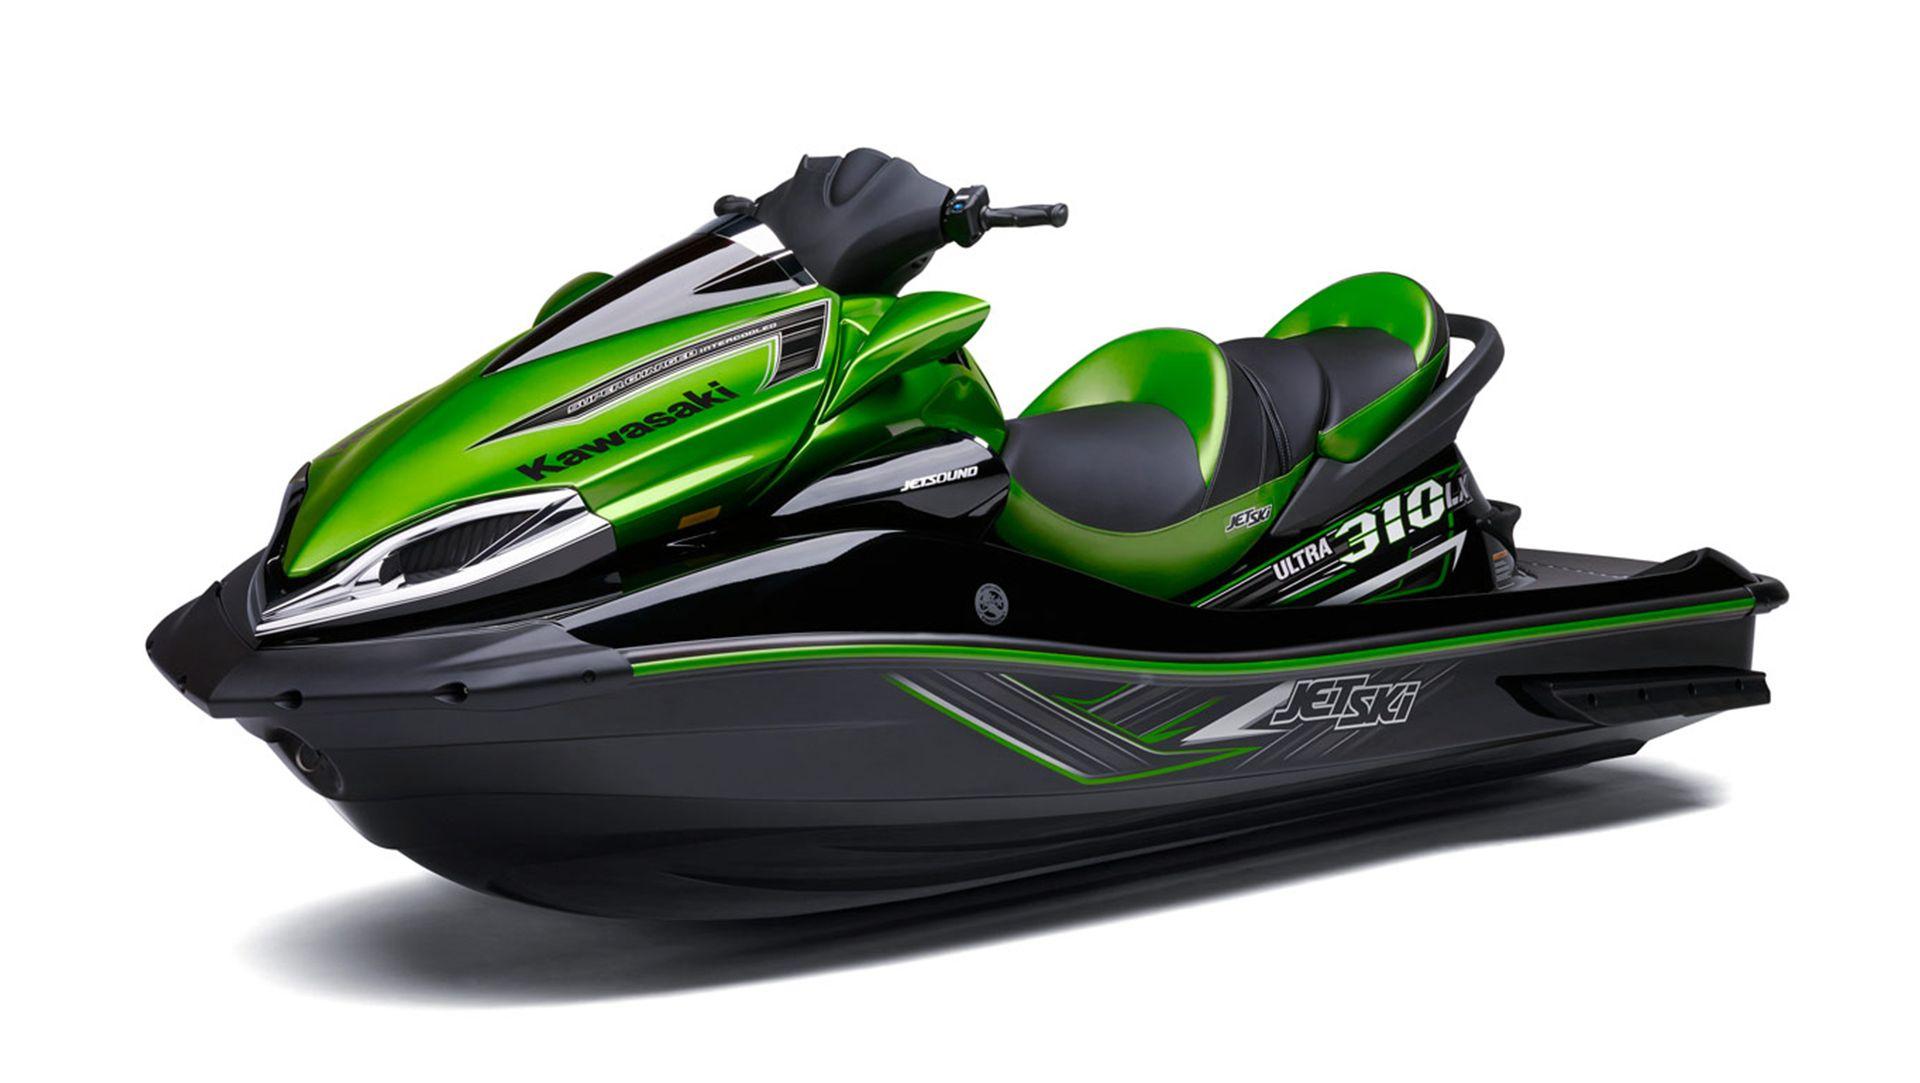 2014 Kawasaki Jet Ski Ultra 310lx Jet Ski Personal Watercraft Skis For Sale